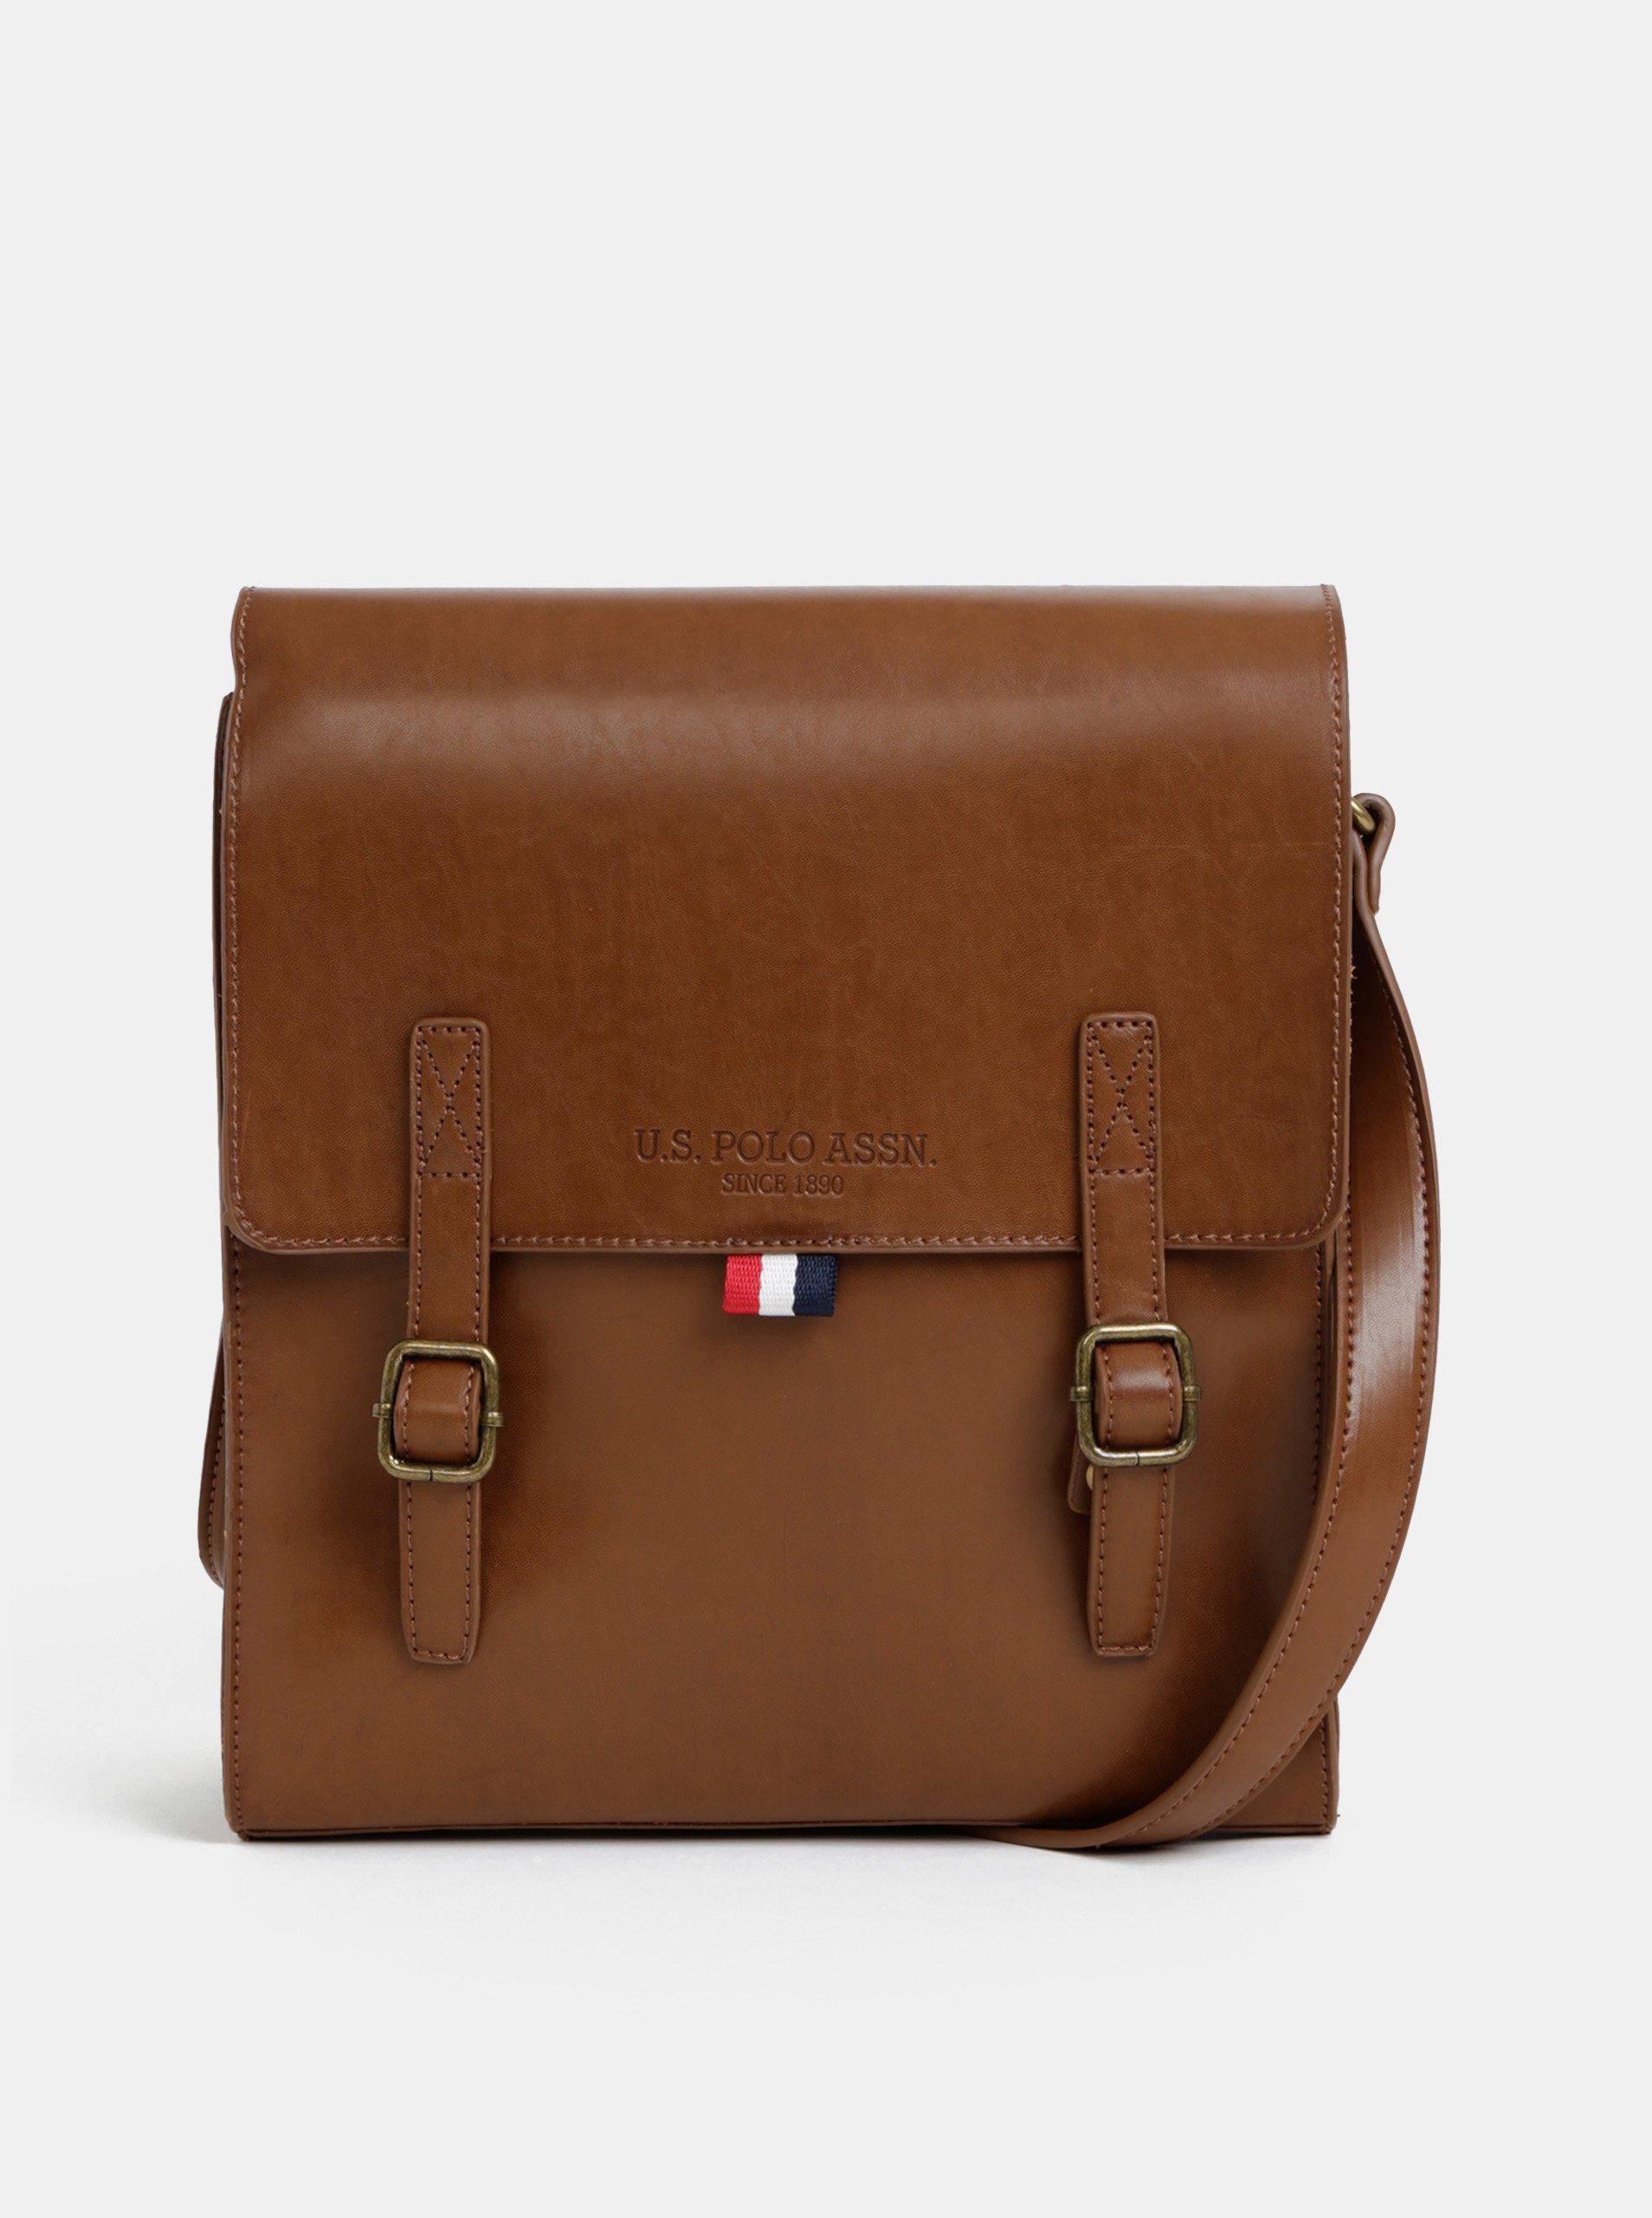 a1431b20ca Hnědá pánská taška U.S. Polo Assn.